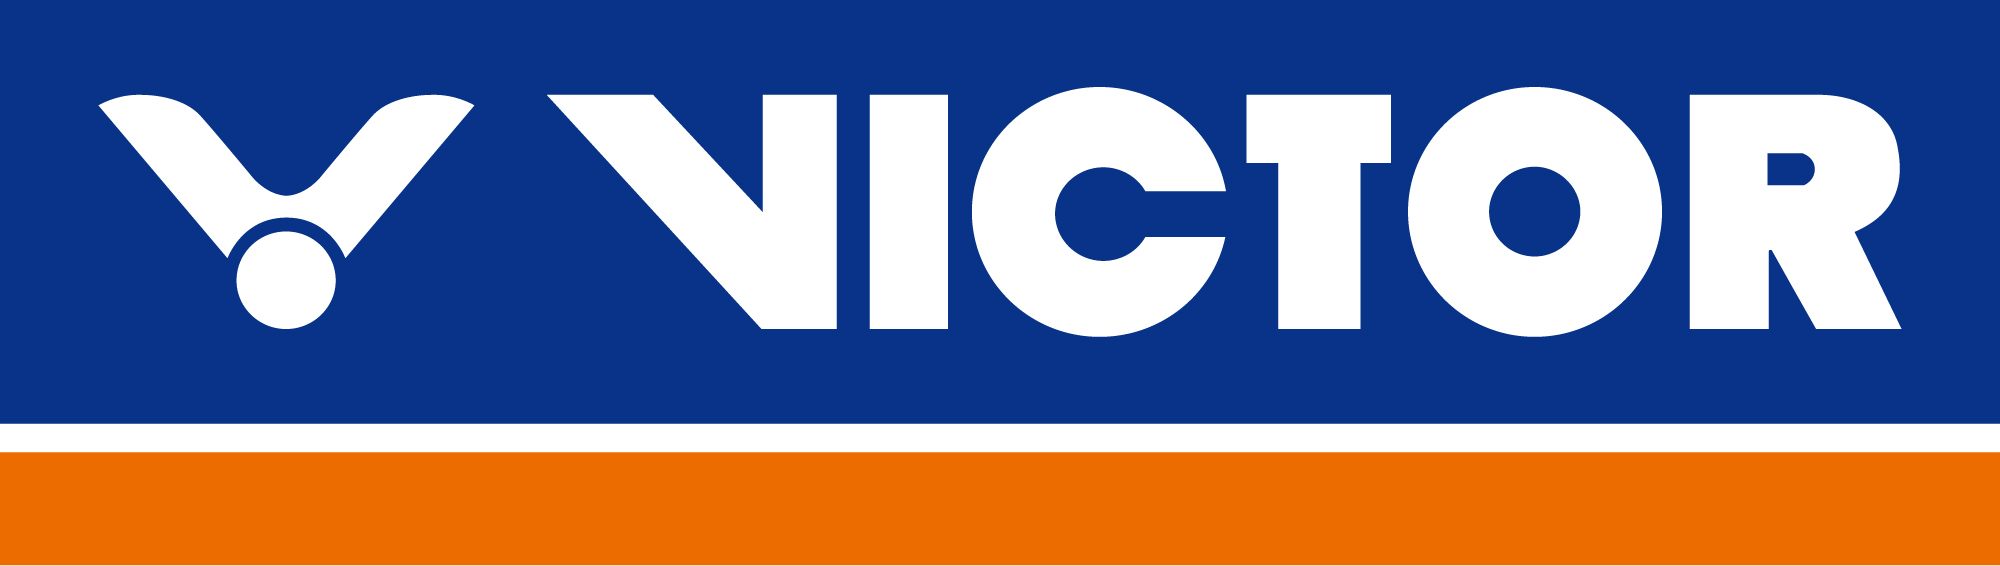 victor logo neu.